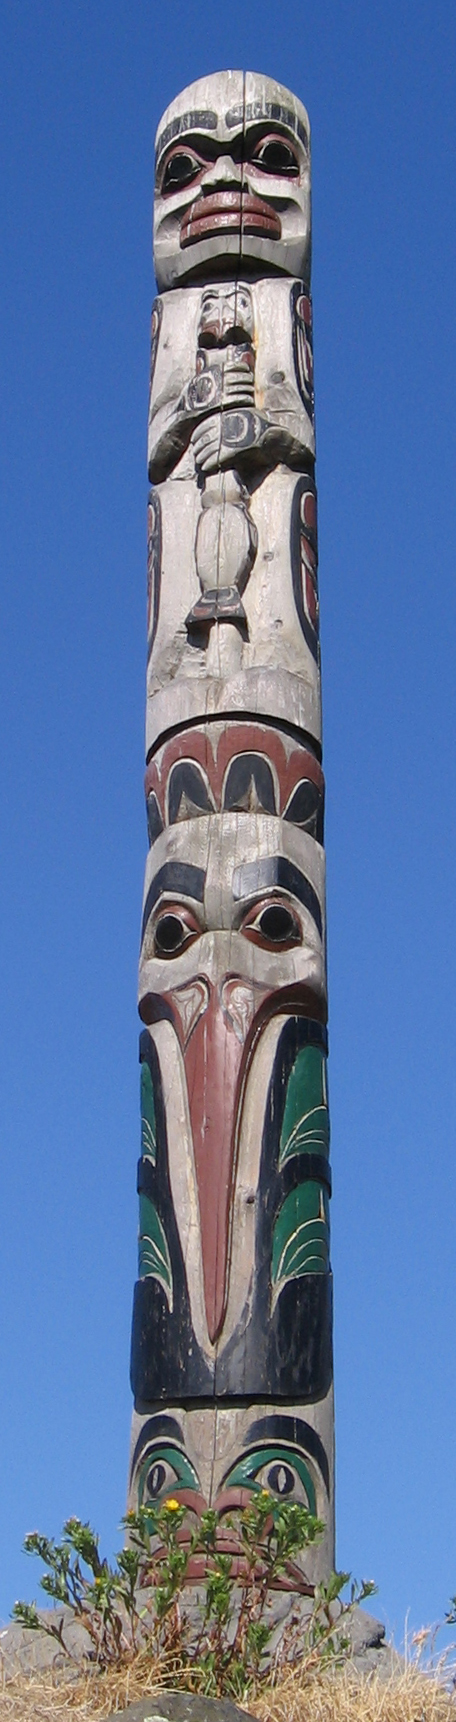 http://upload.wikimedia.org/wikipedia/commons/a/a1/Totem_Park_pole_1.jpg